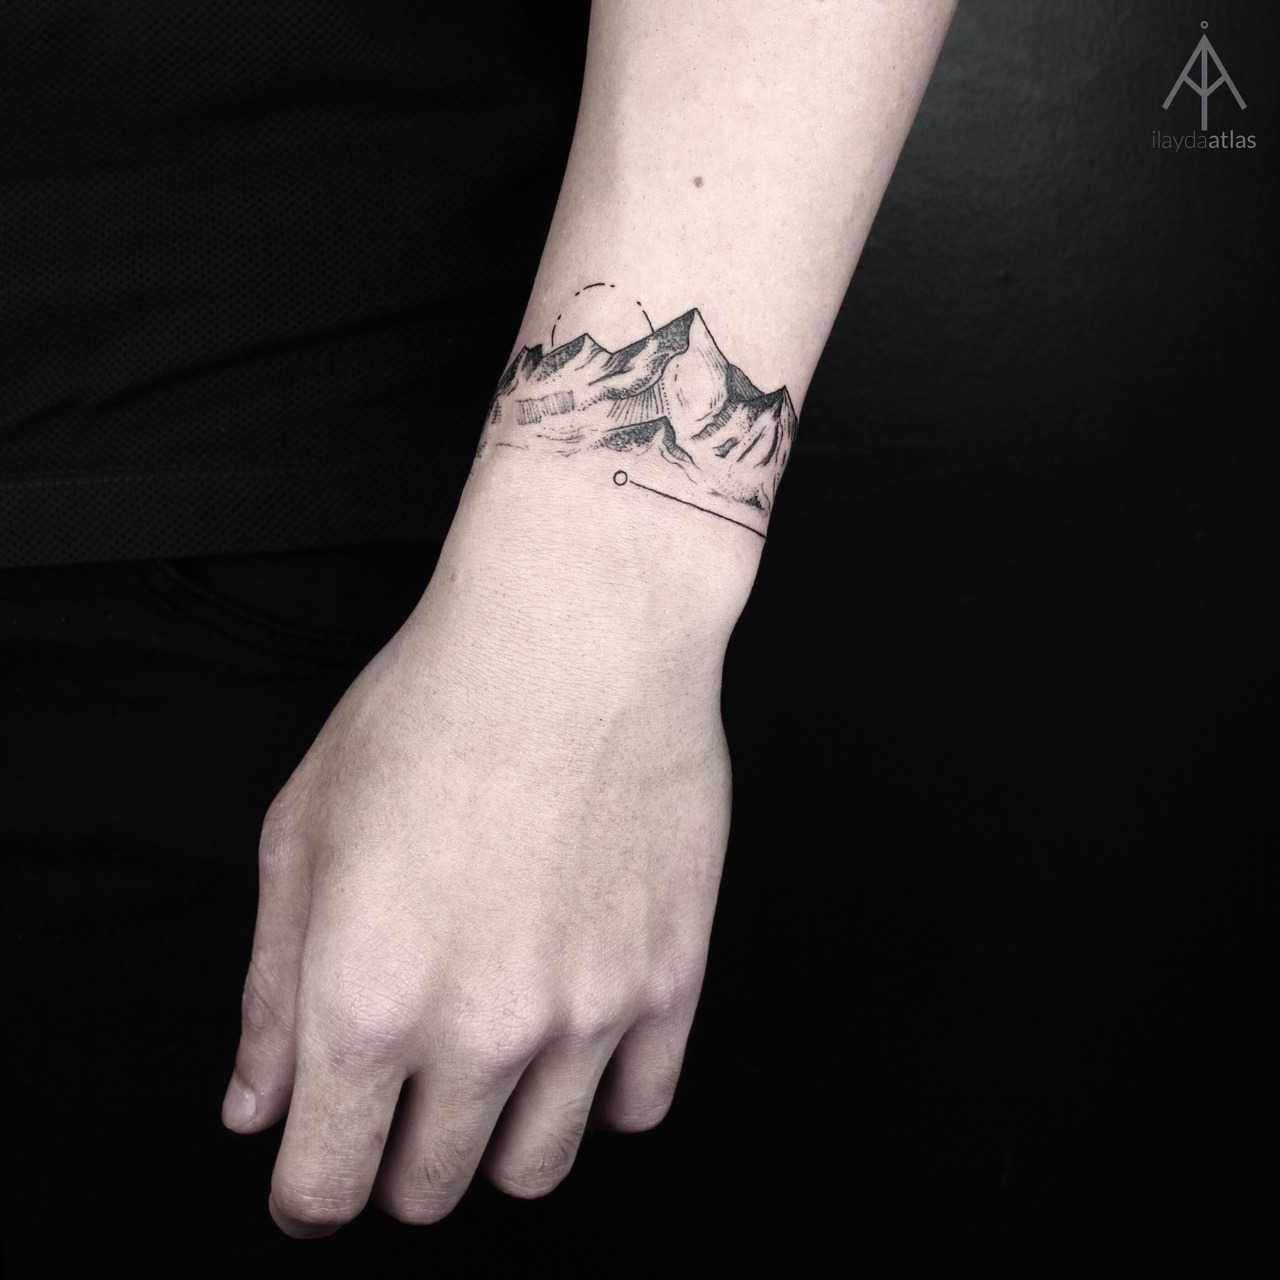 Mountain bracelet tattoo by artist Ilayda Atlas http